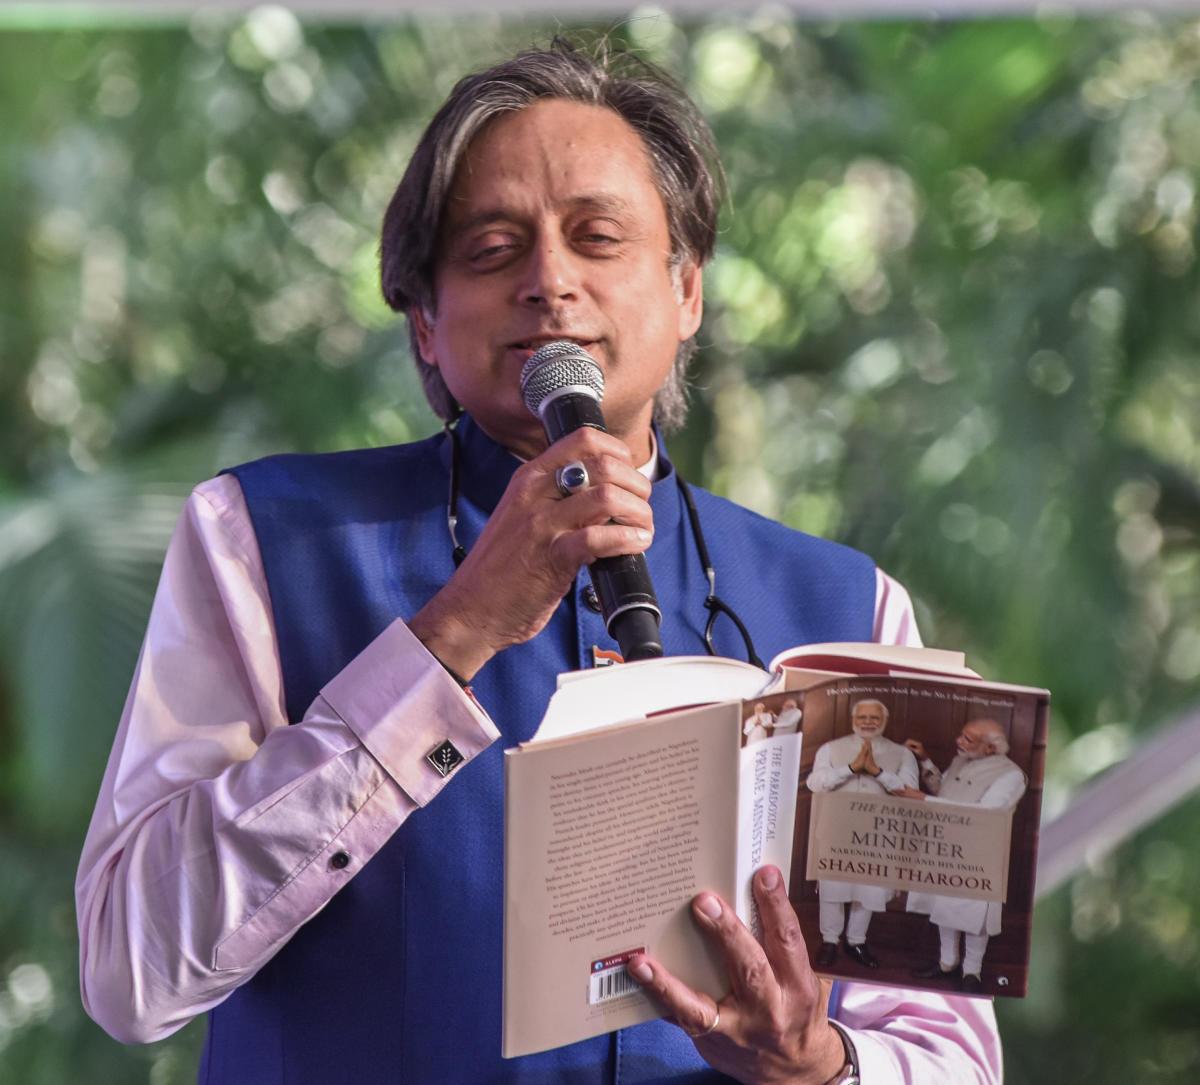 Shashi Tharoor speaks at the Bangalore Literature Festival on Sunday. DH Photo/S K Dinesh